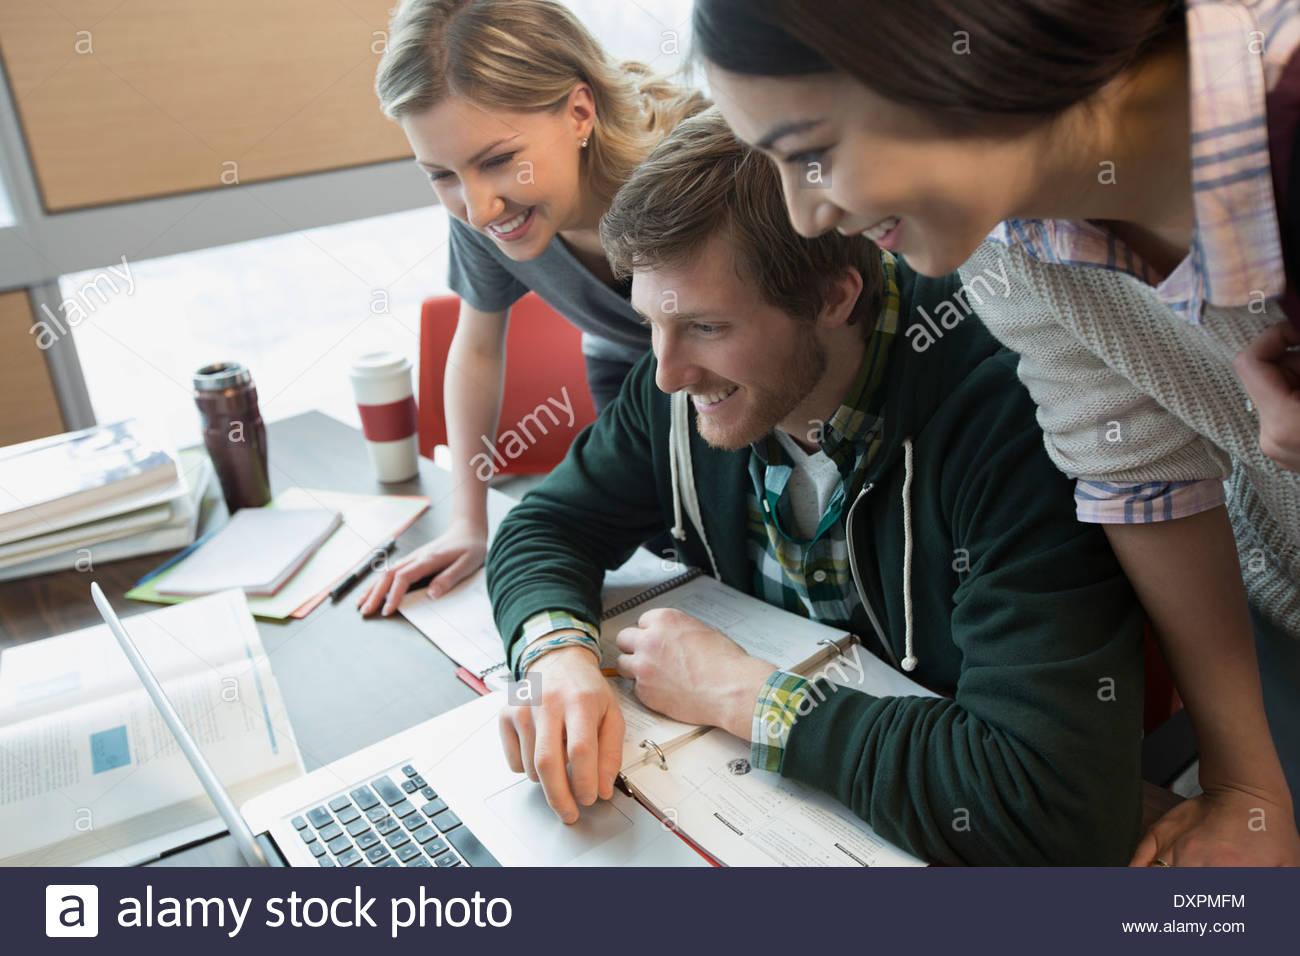 College students gathered around laptop - Stock Image